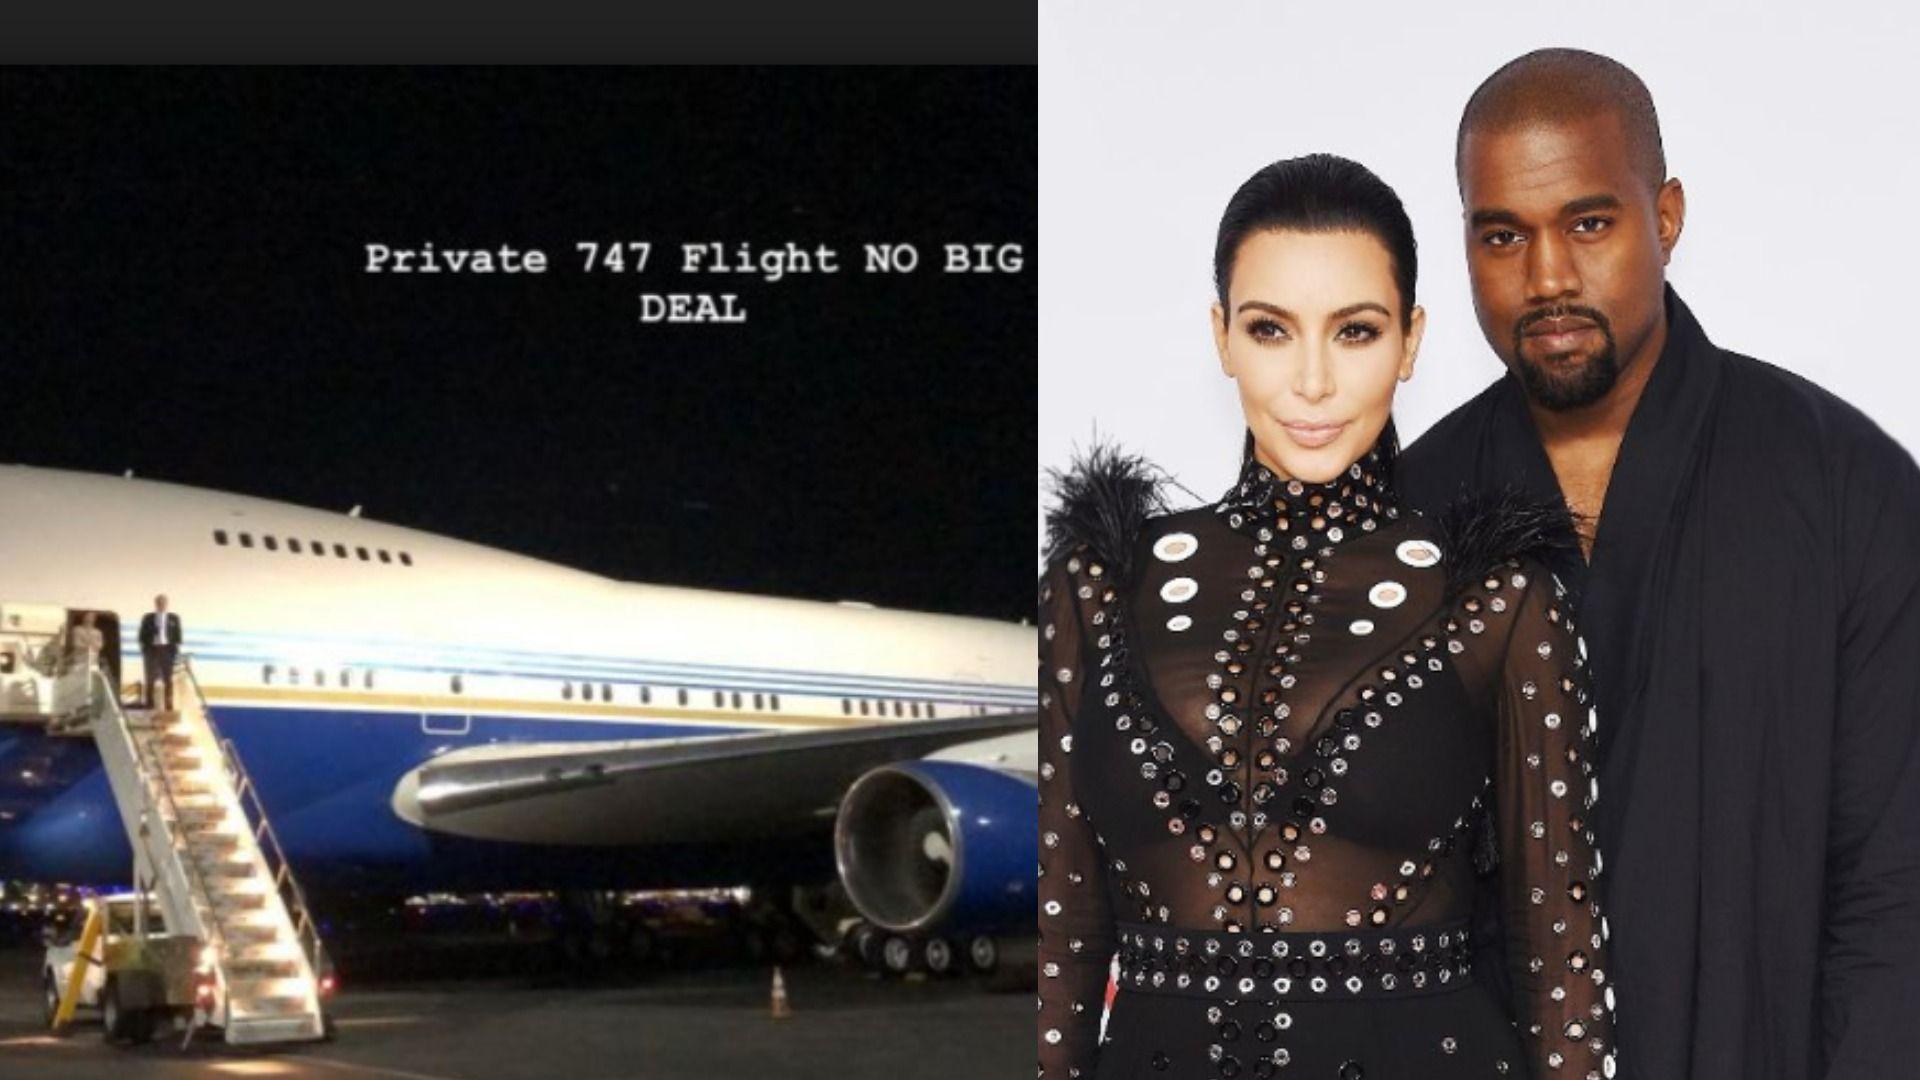 Working While Traveling Can Be A Real Hard Unless You Re Yeezy Kim Kardashian Posted On Her Instagram Story To Take All Her Fol Kim Kardashian Kardashian Kim